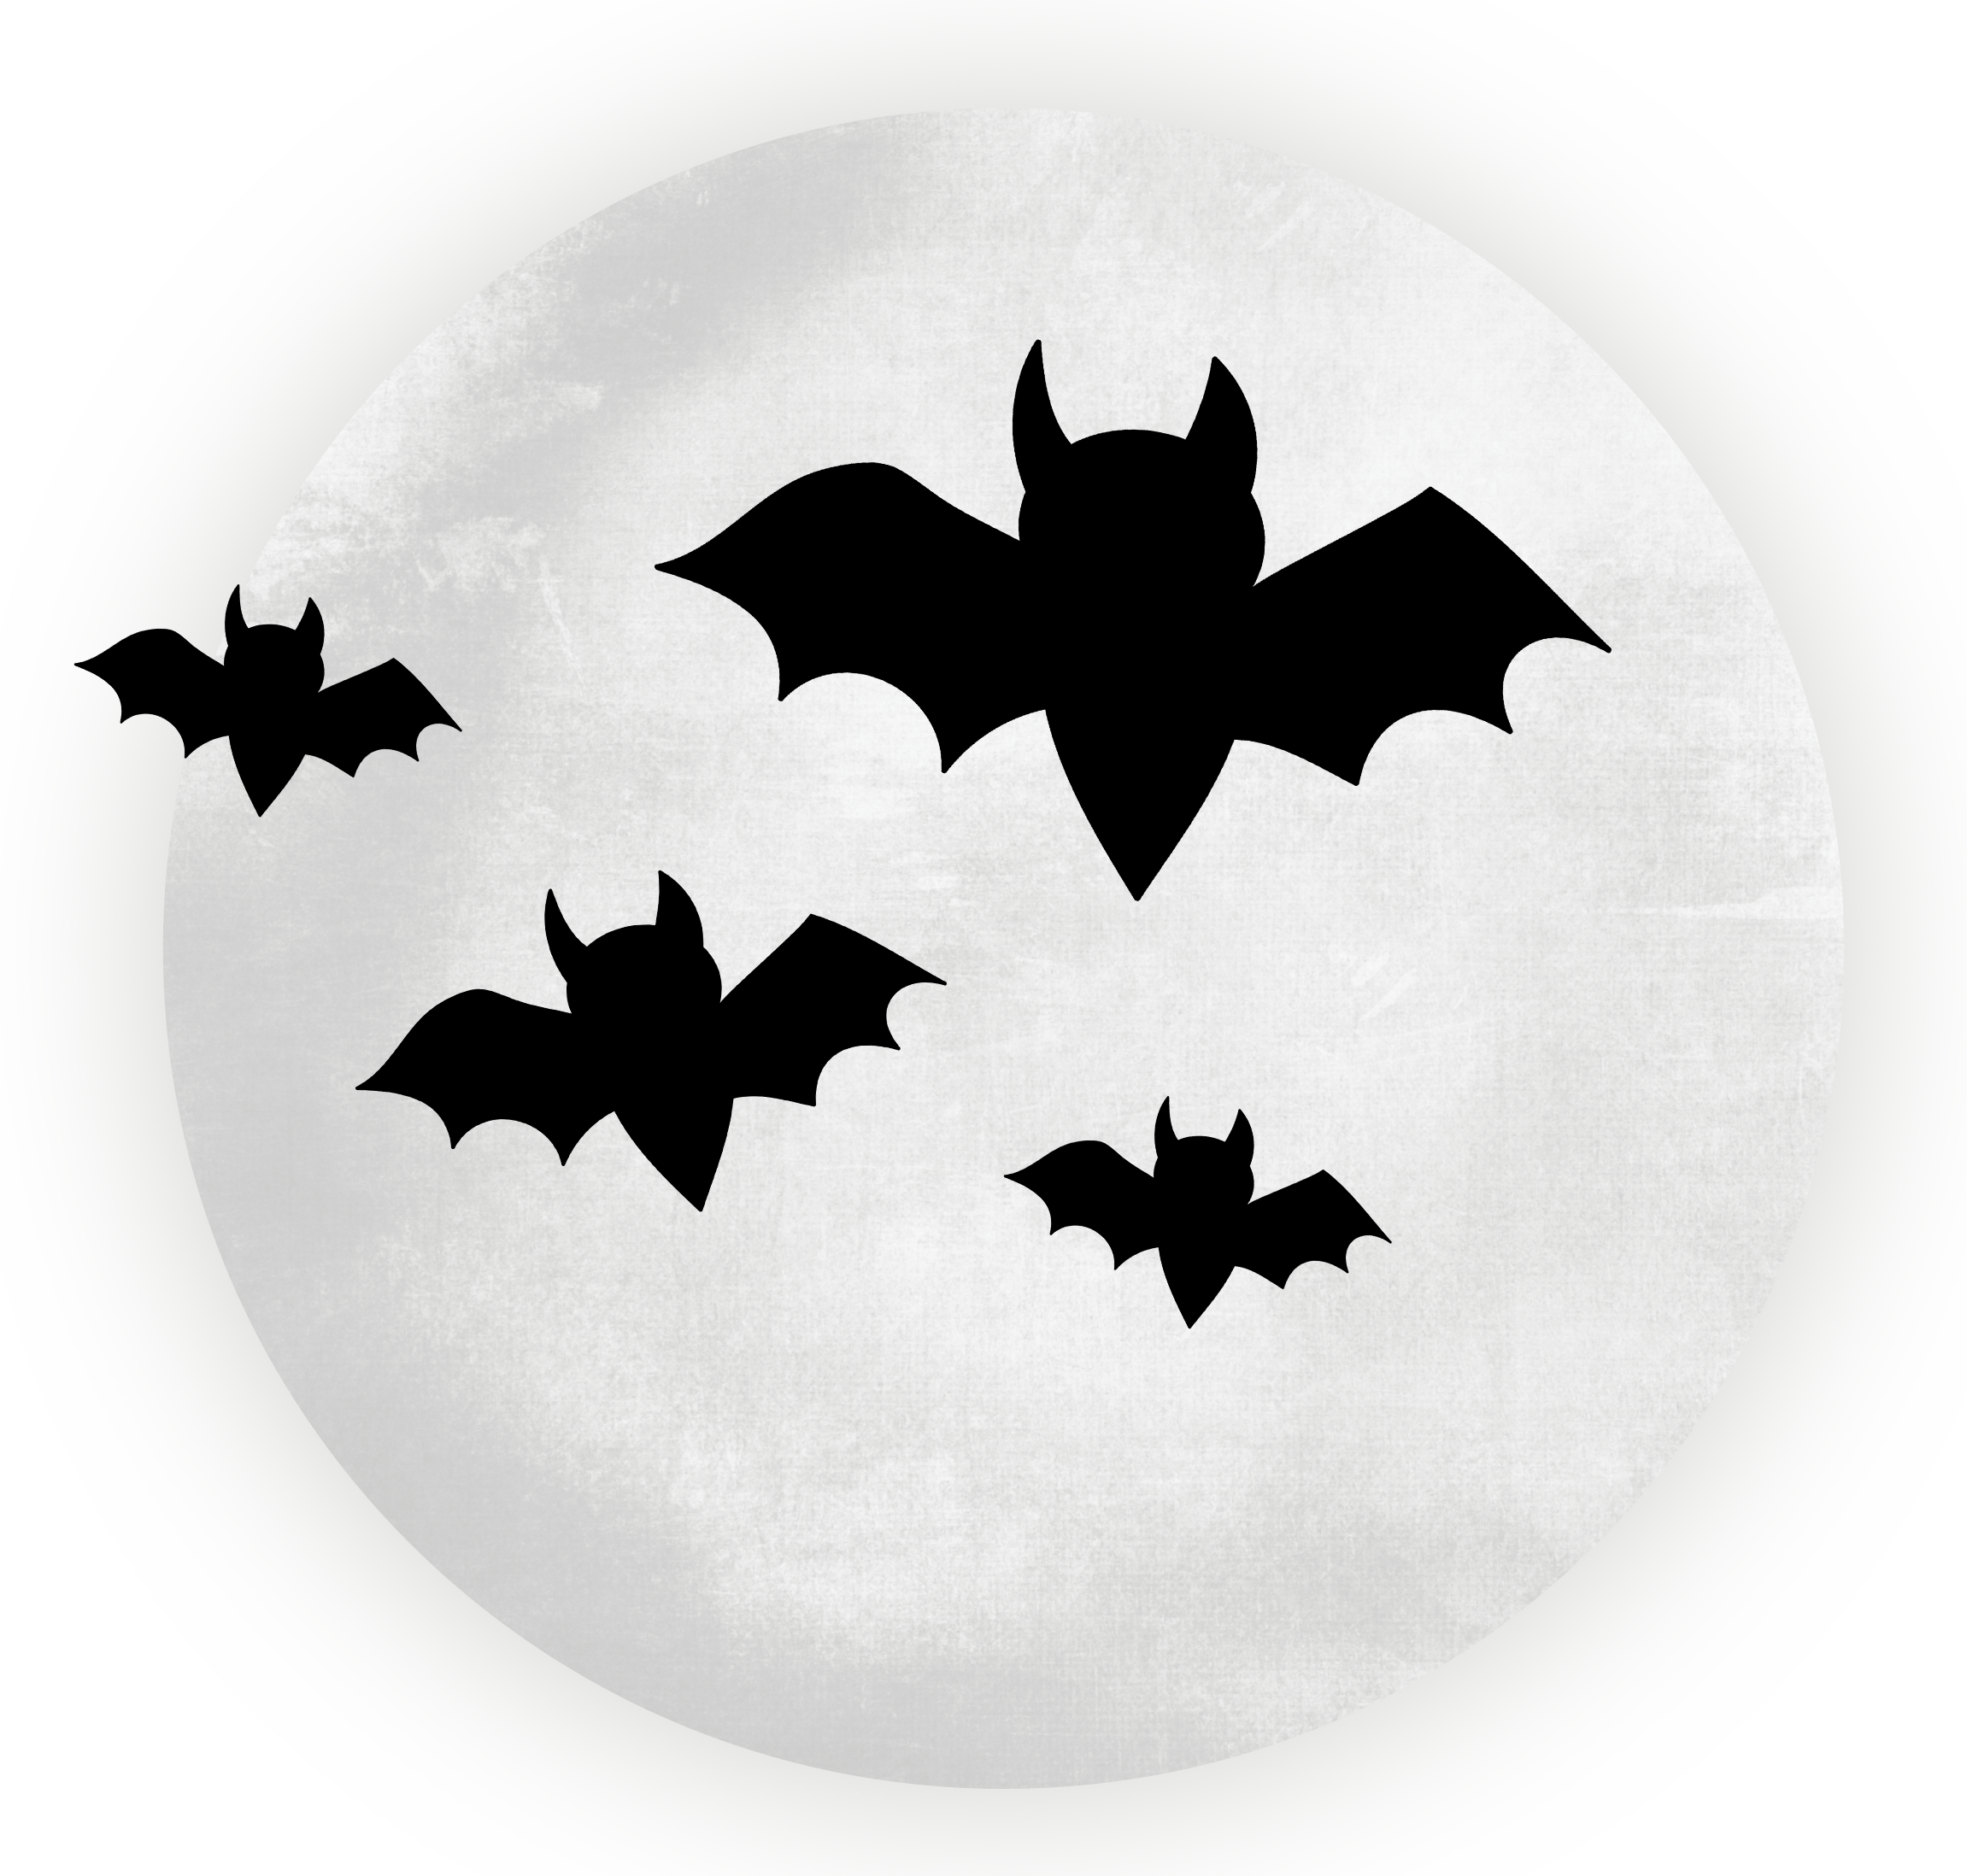 Halloween Moon Clip Art - ClipartFest-Halloween moon clip art - ClipartFest-8